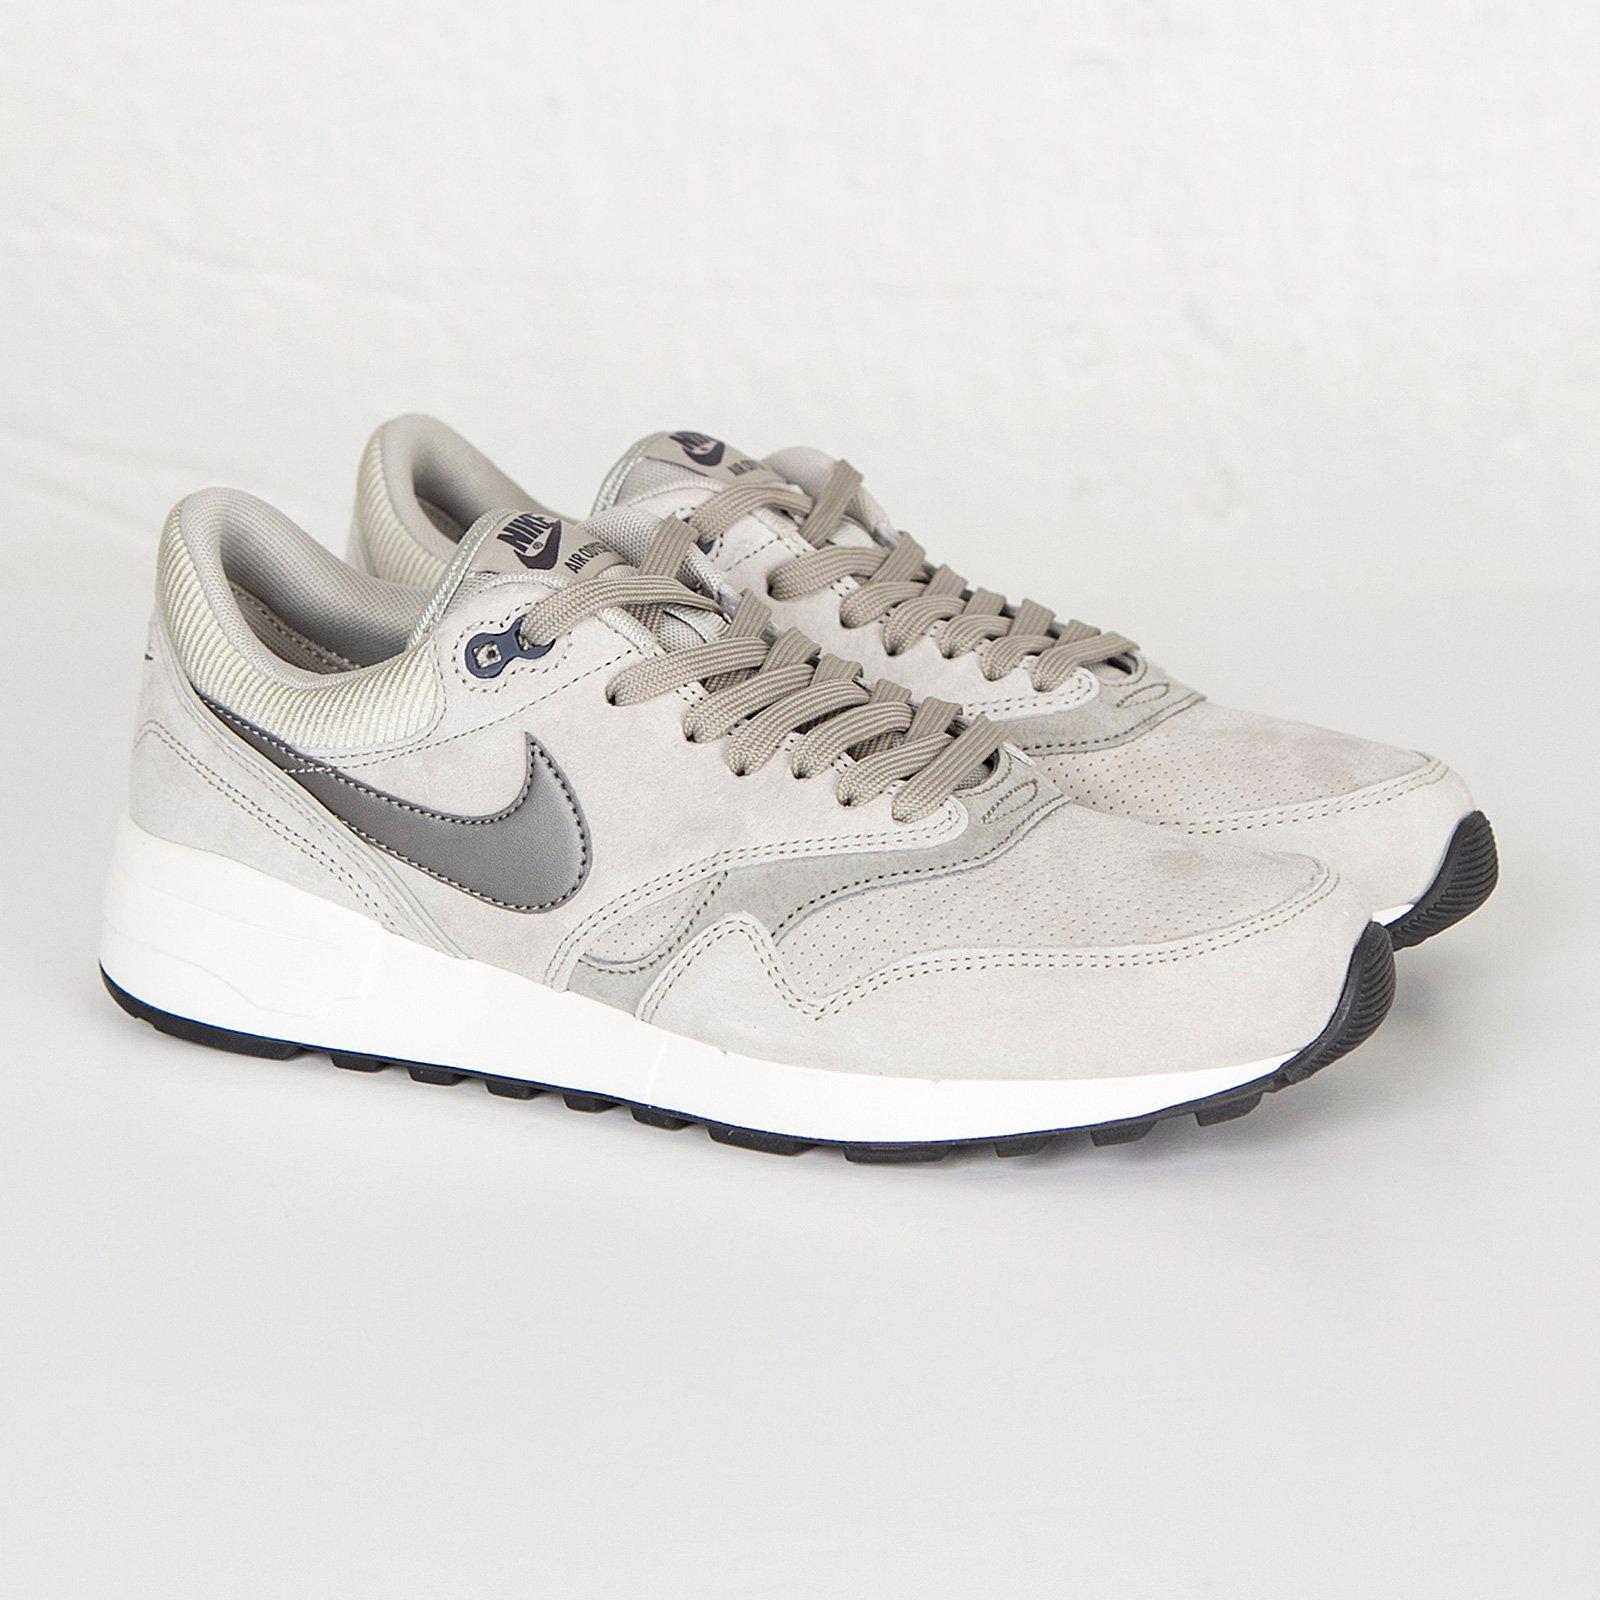 Nike Air Odyssey Leather - 684773-009